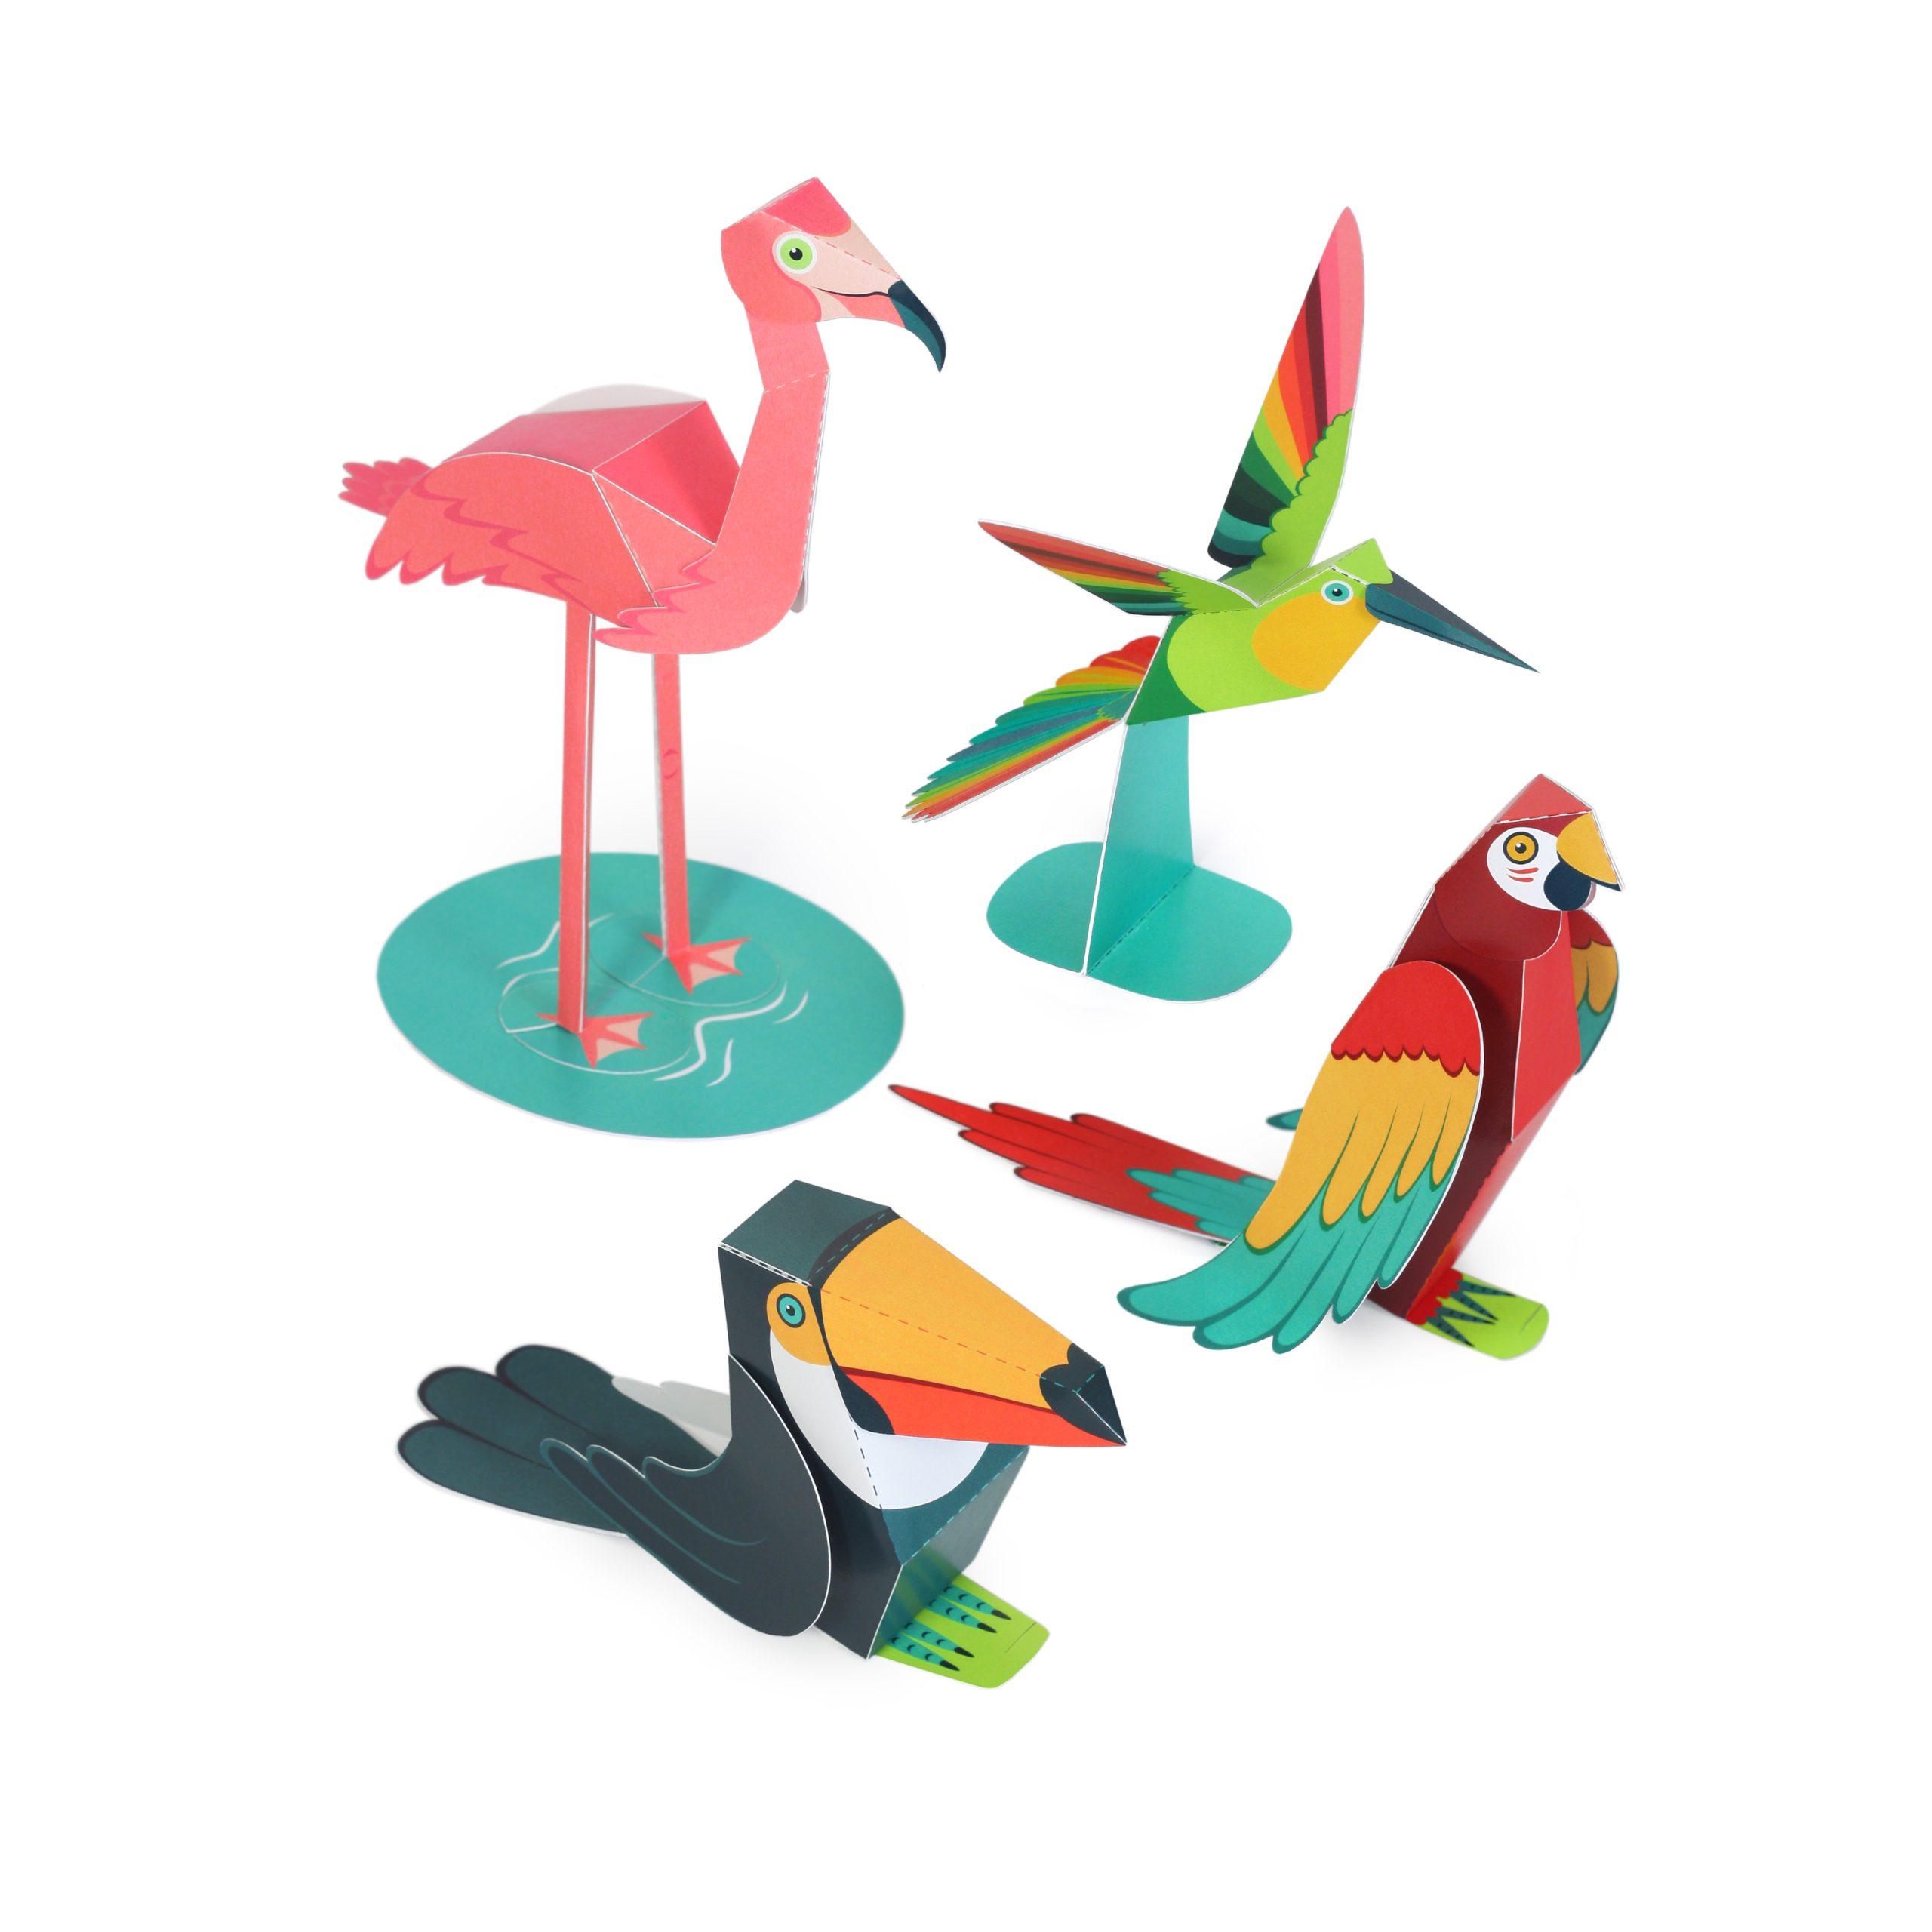 Tropical Birds Paper Toys